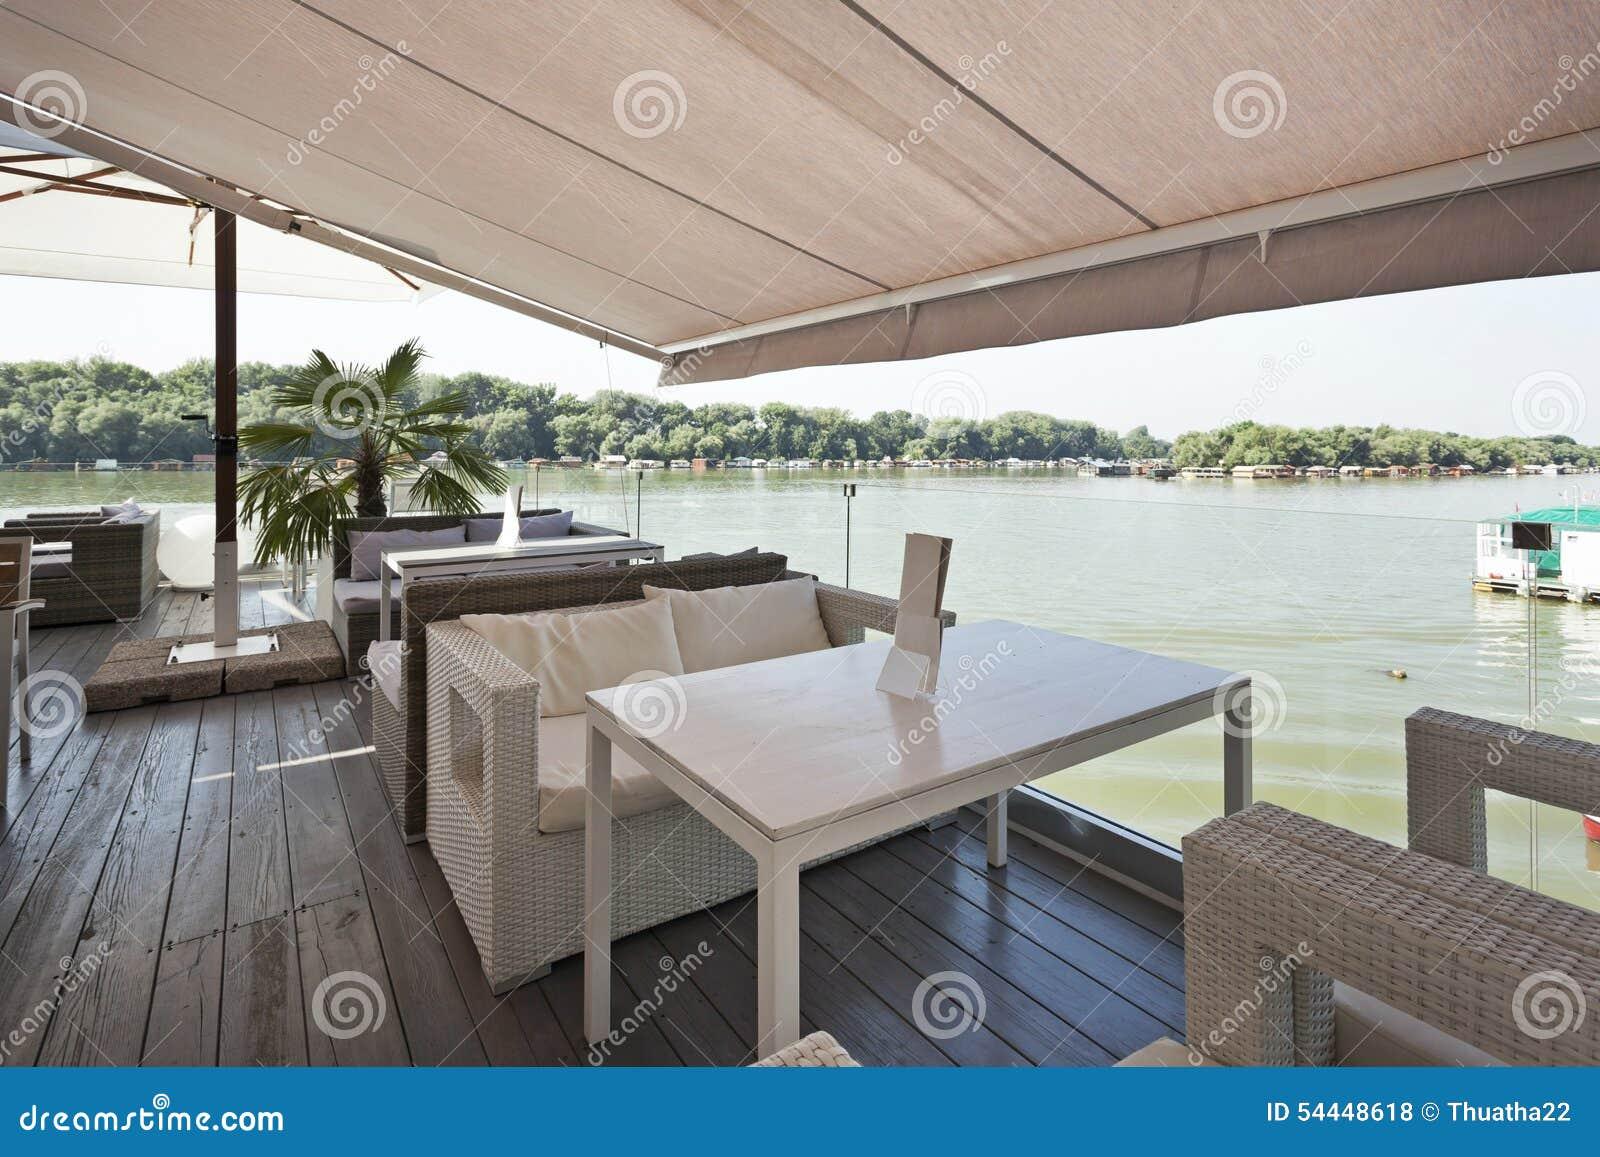 Interior of a riverside cafe